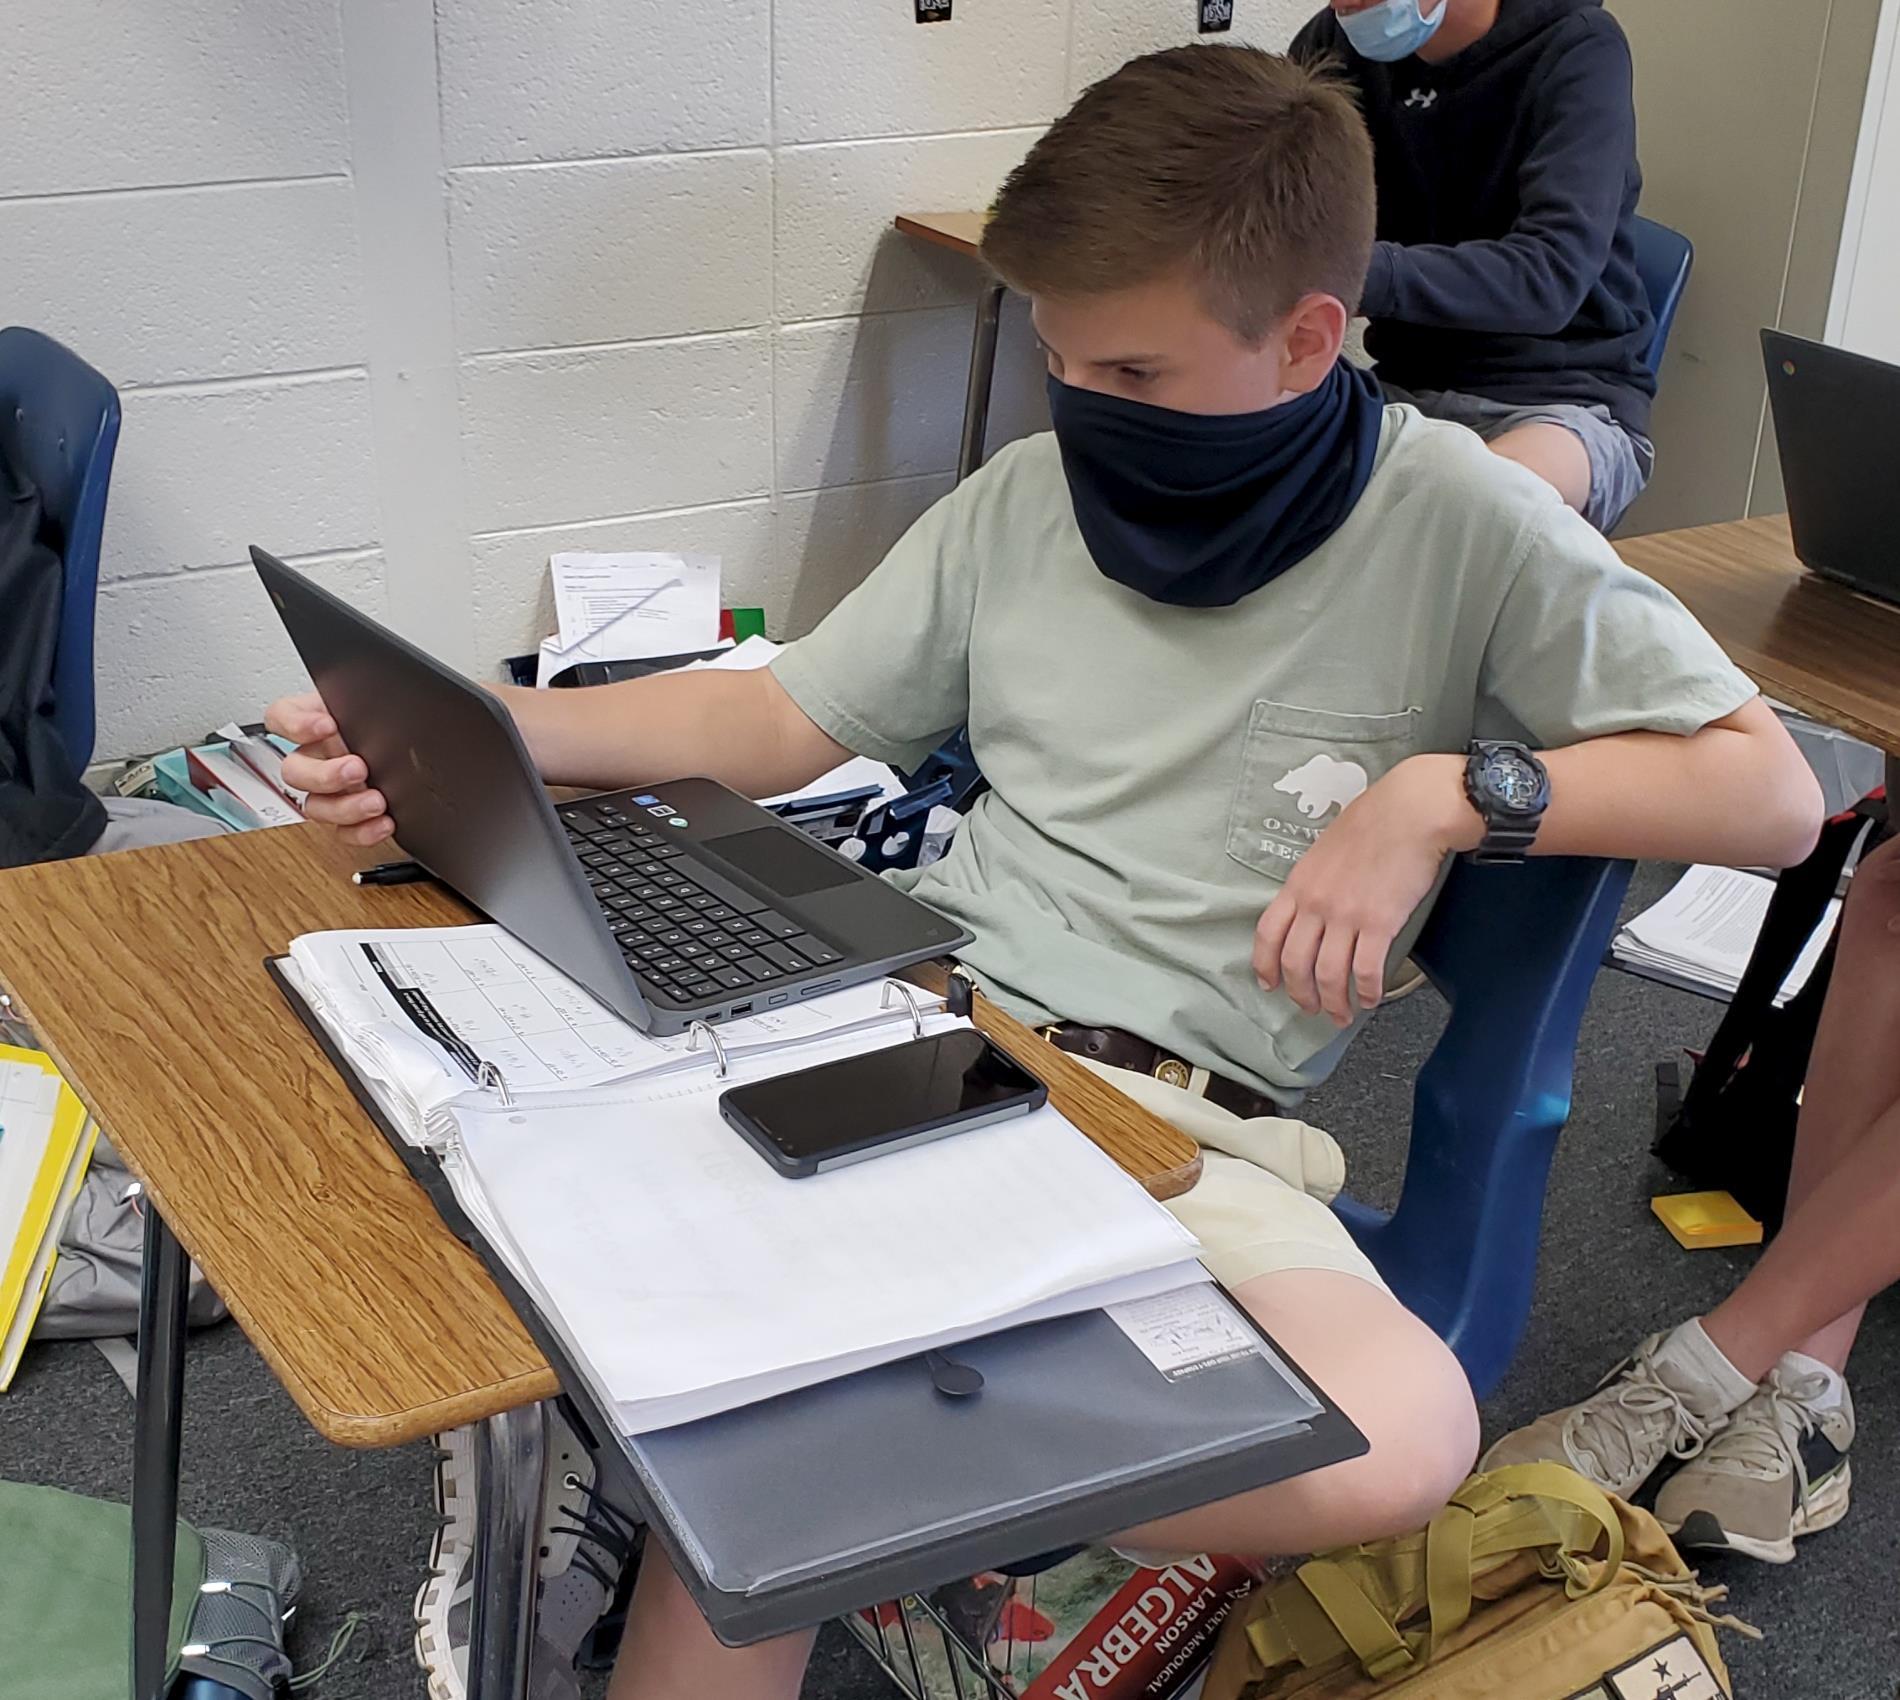 Student using new chromebook